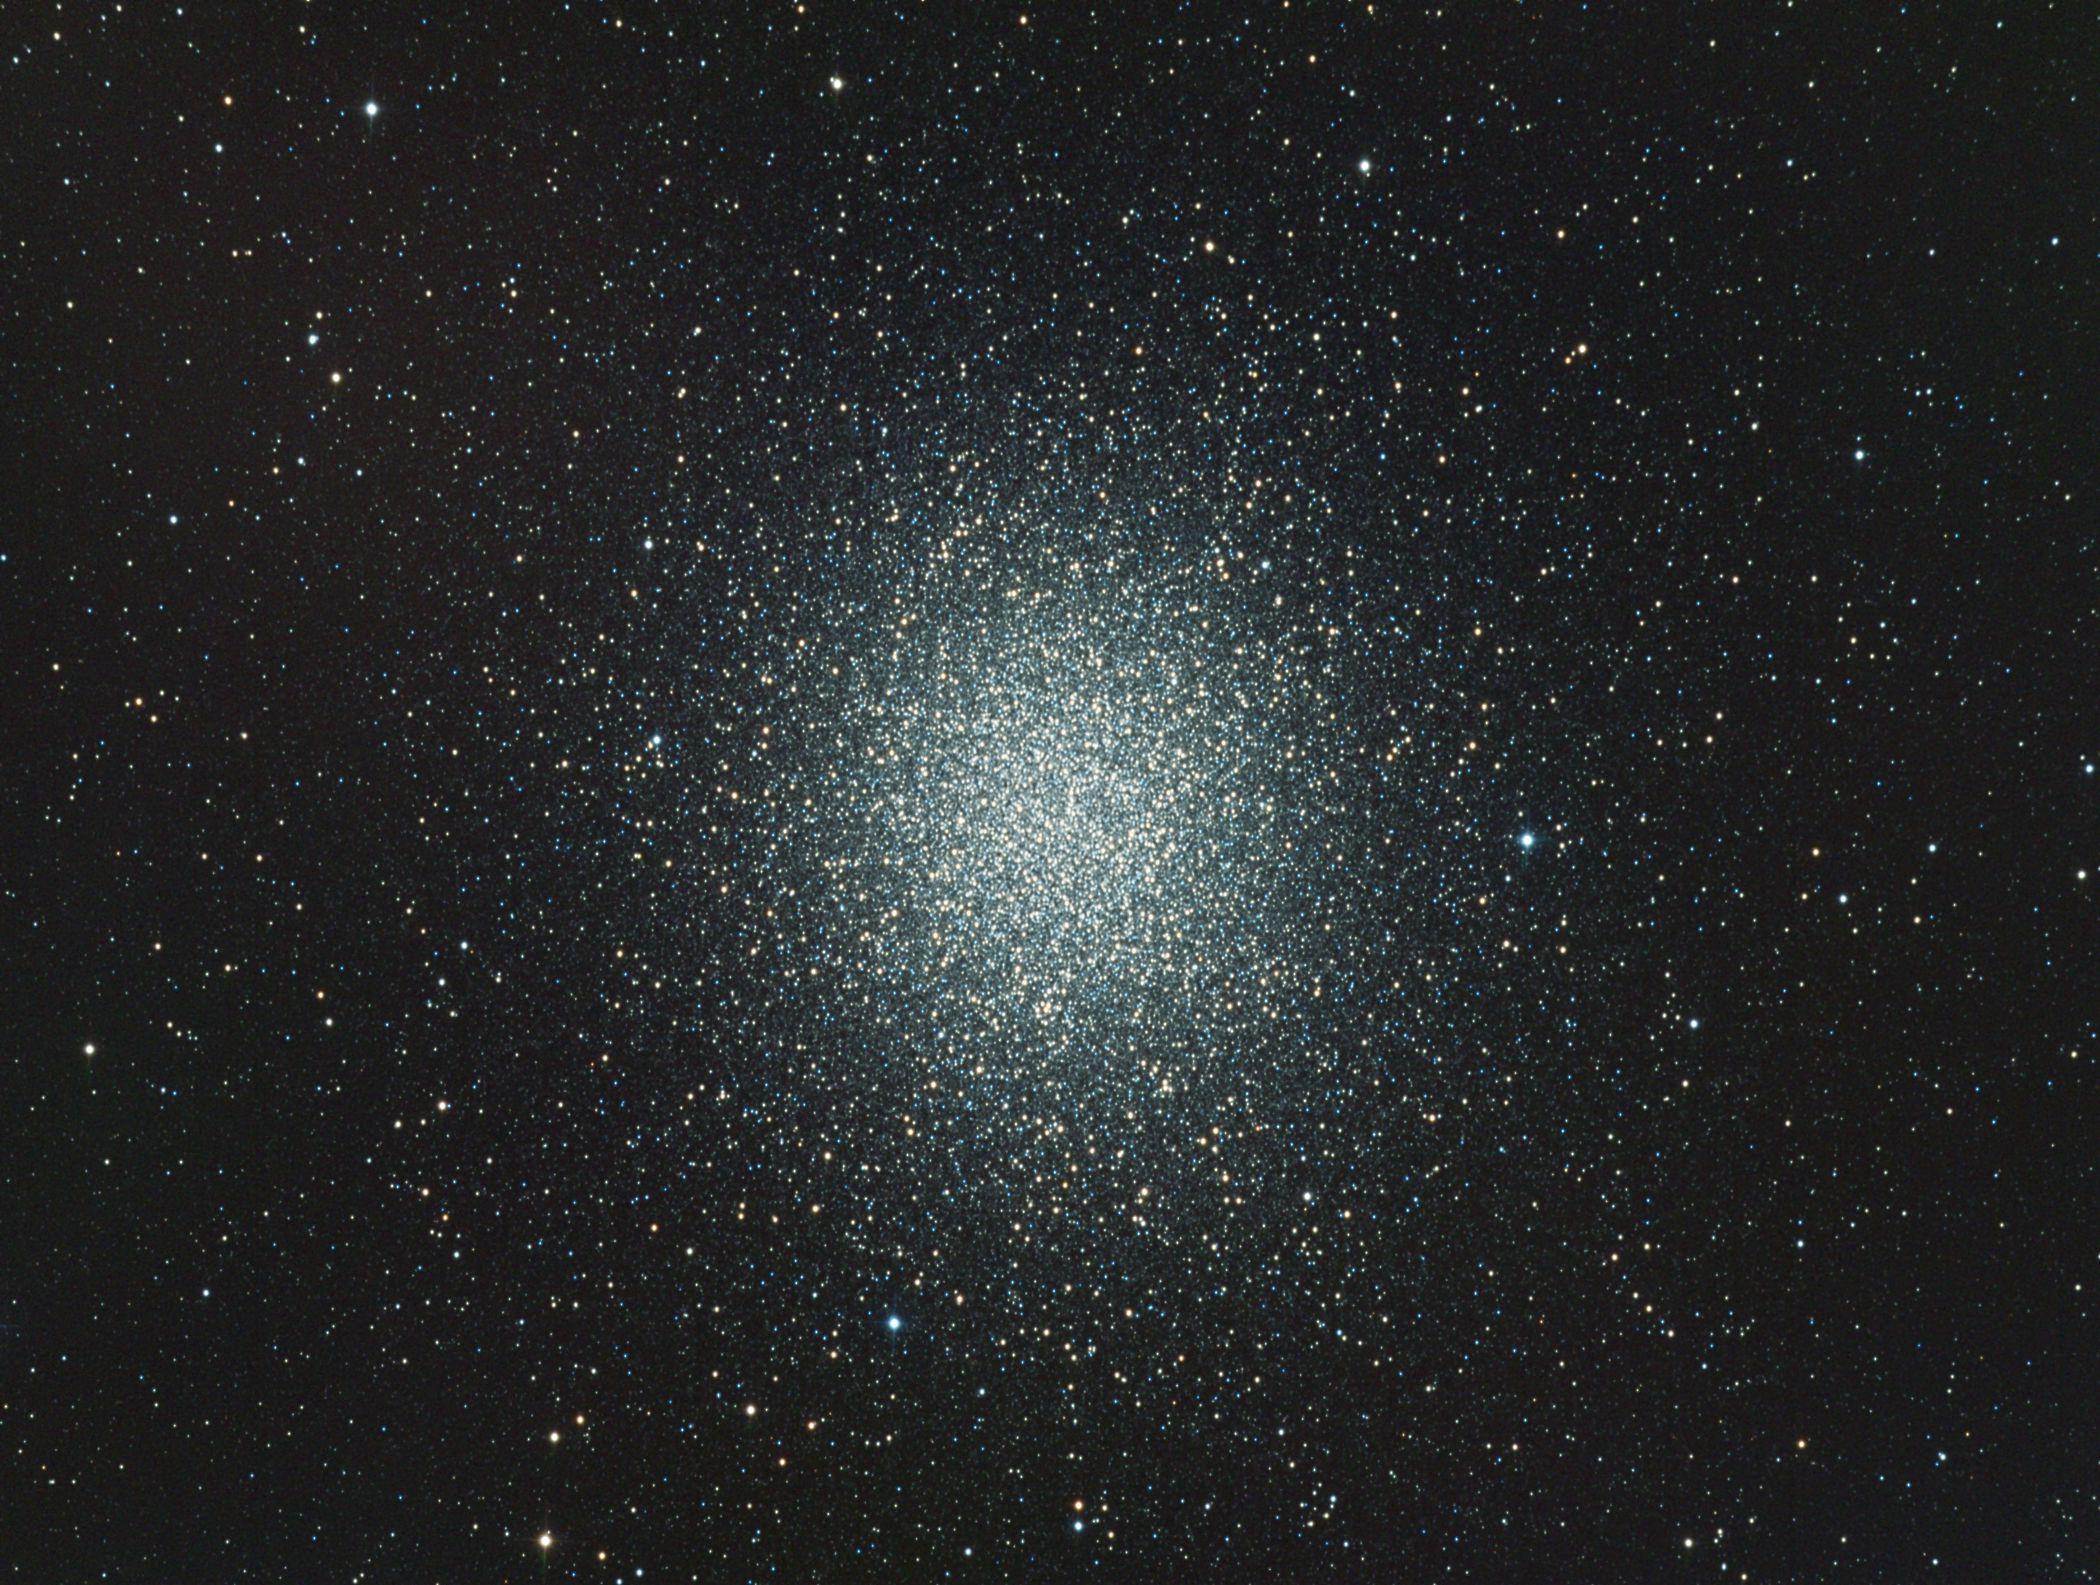 Globular Star Cluster Omega Centauri NGC 5139